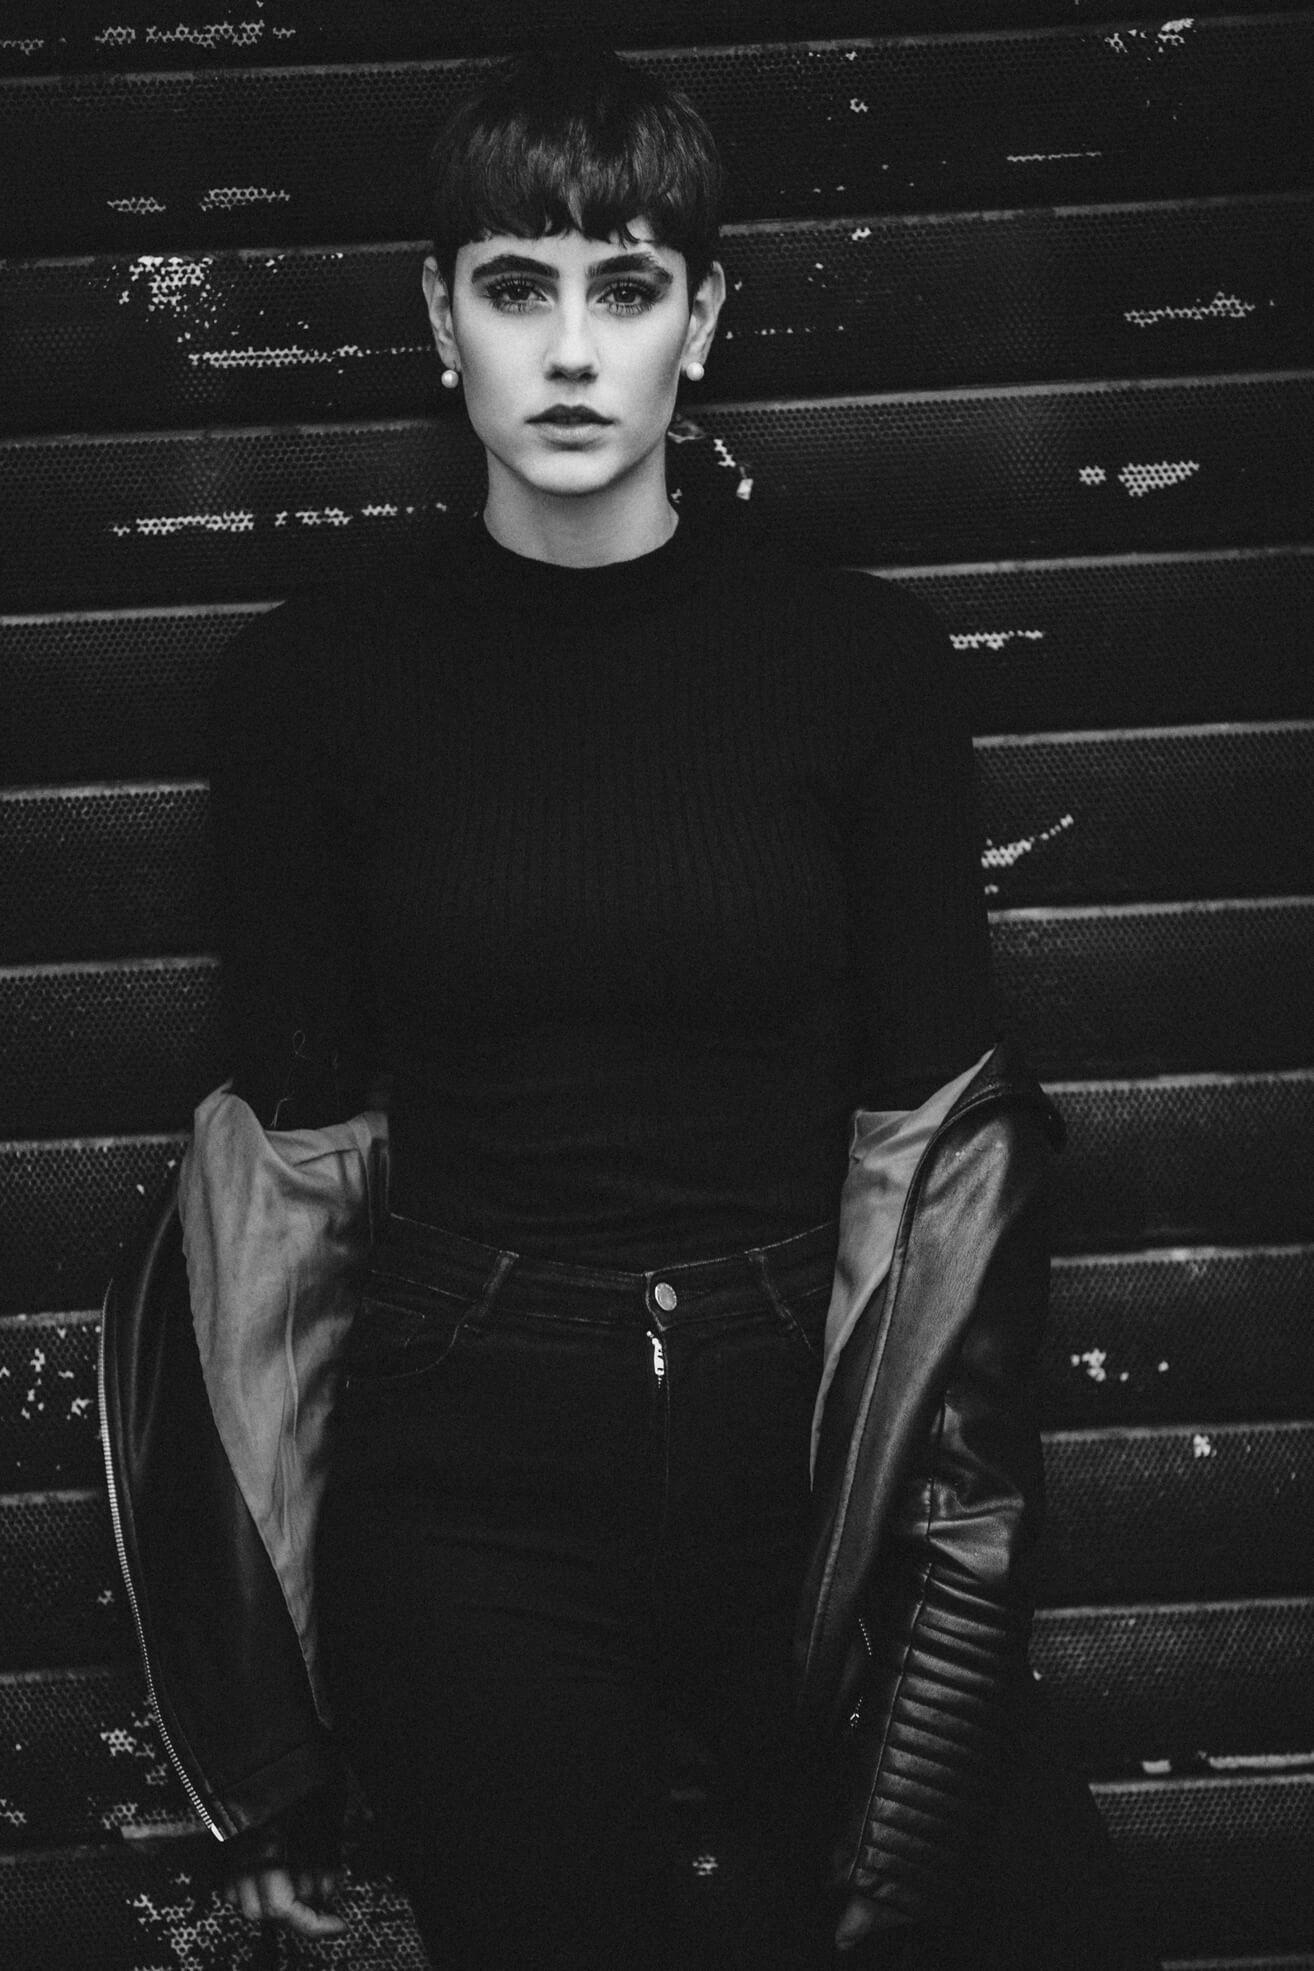 Justine Model